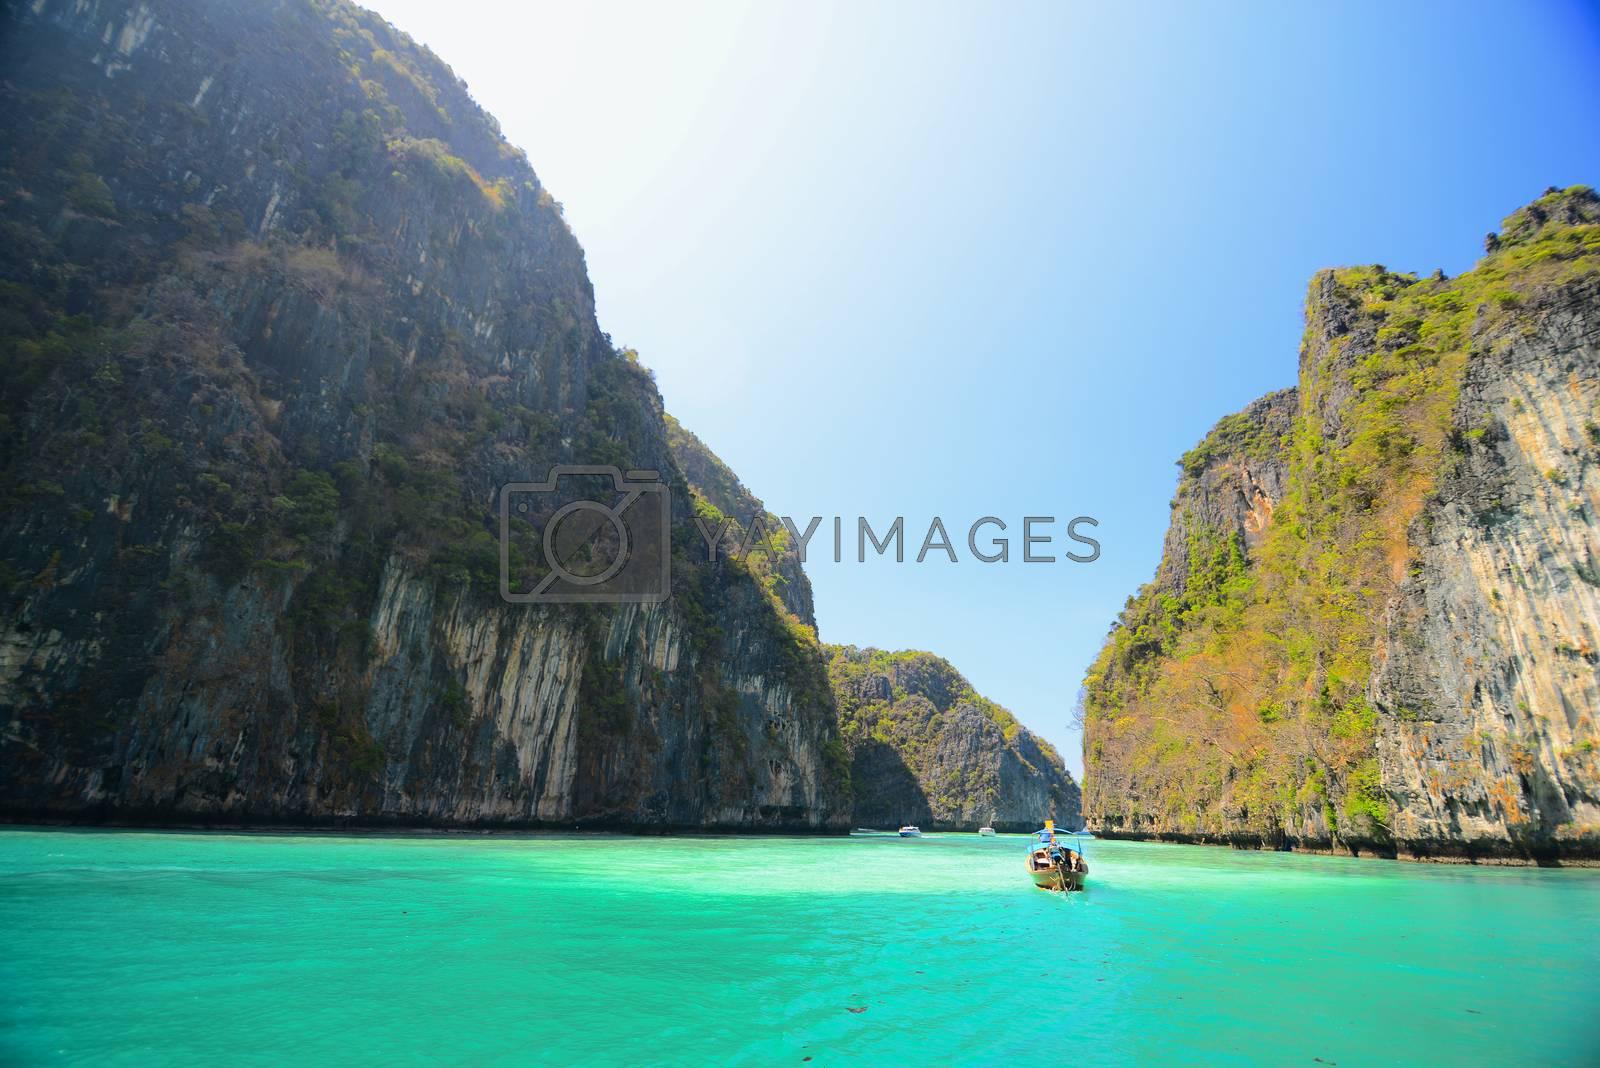 Royalty free image of Maya Bay by antpkr